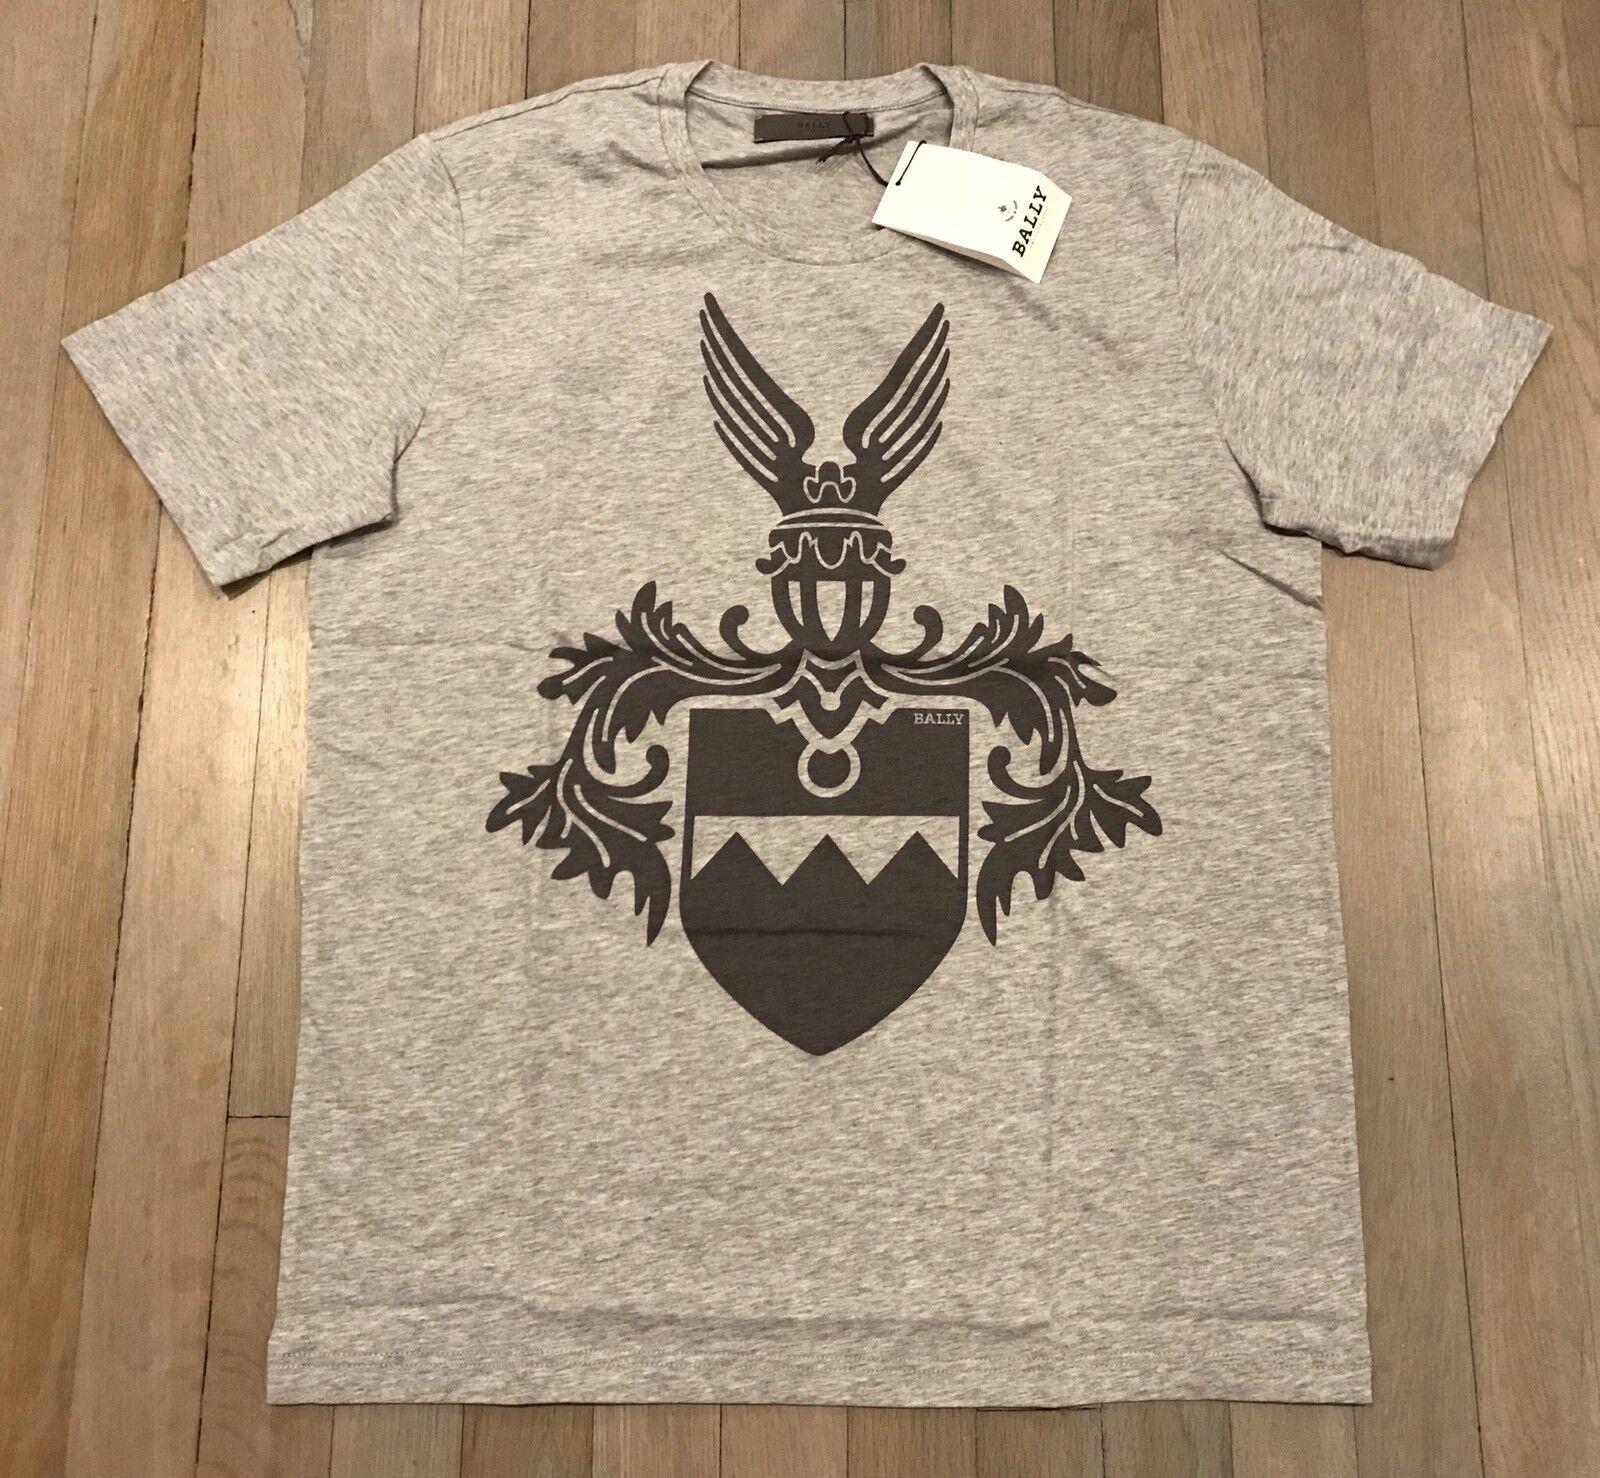 422 Bally grau Cotton T-shirt Größe XL, EU 54, Made in